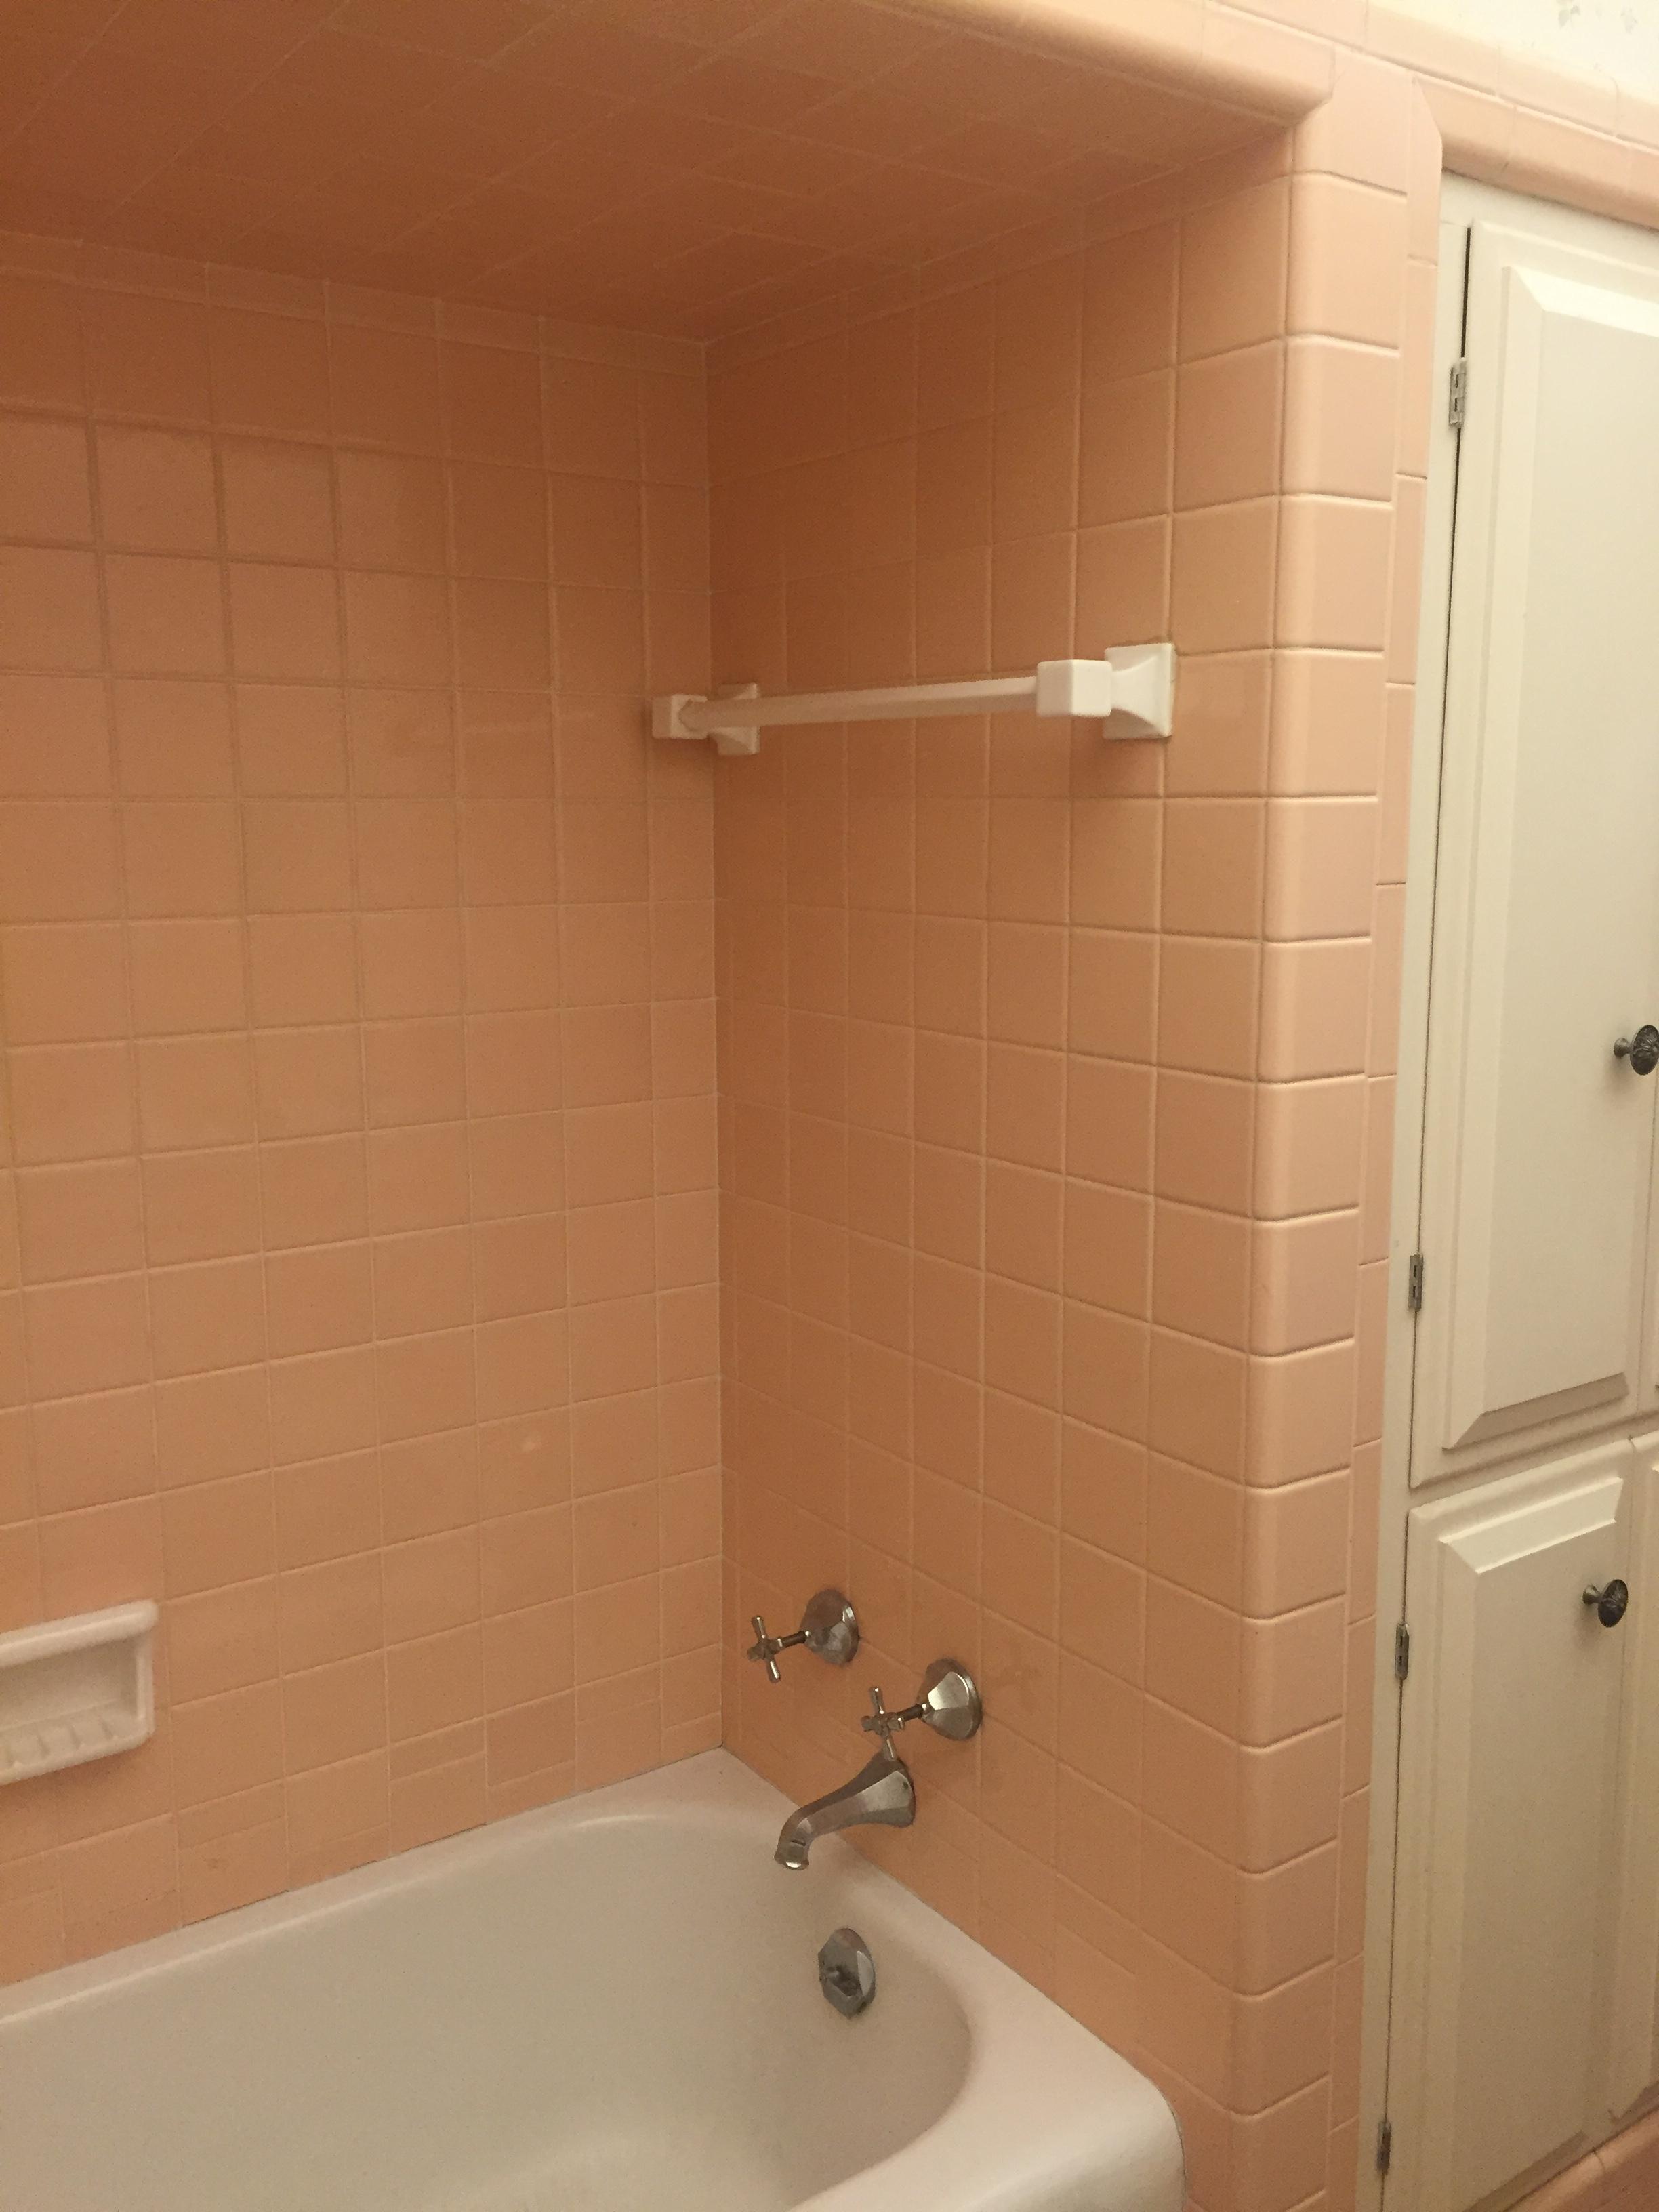 0091 Bath 1 Before.JPG